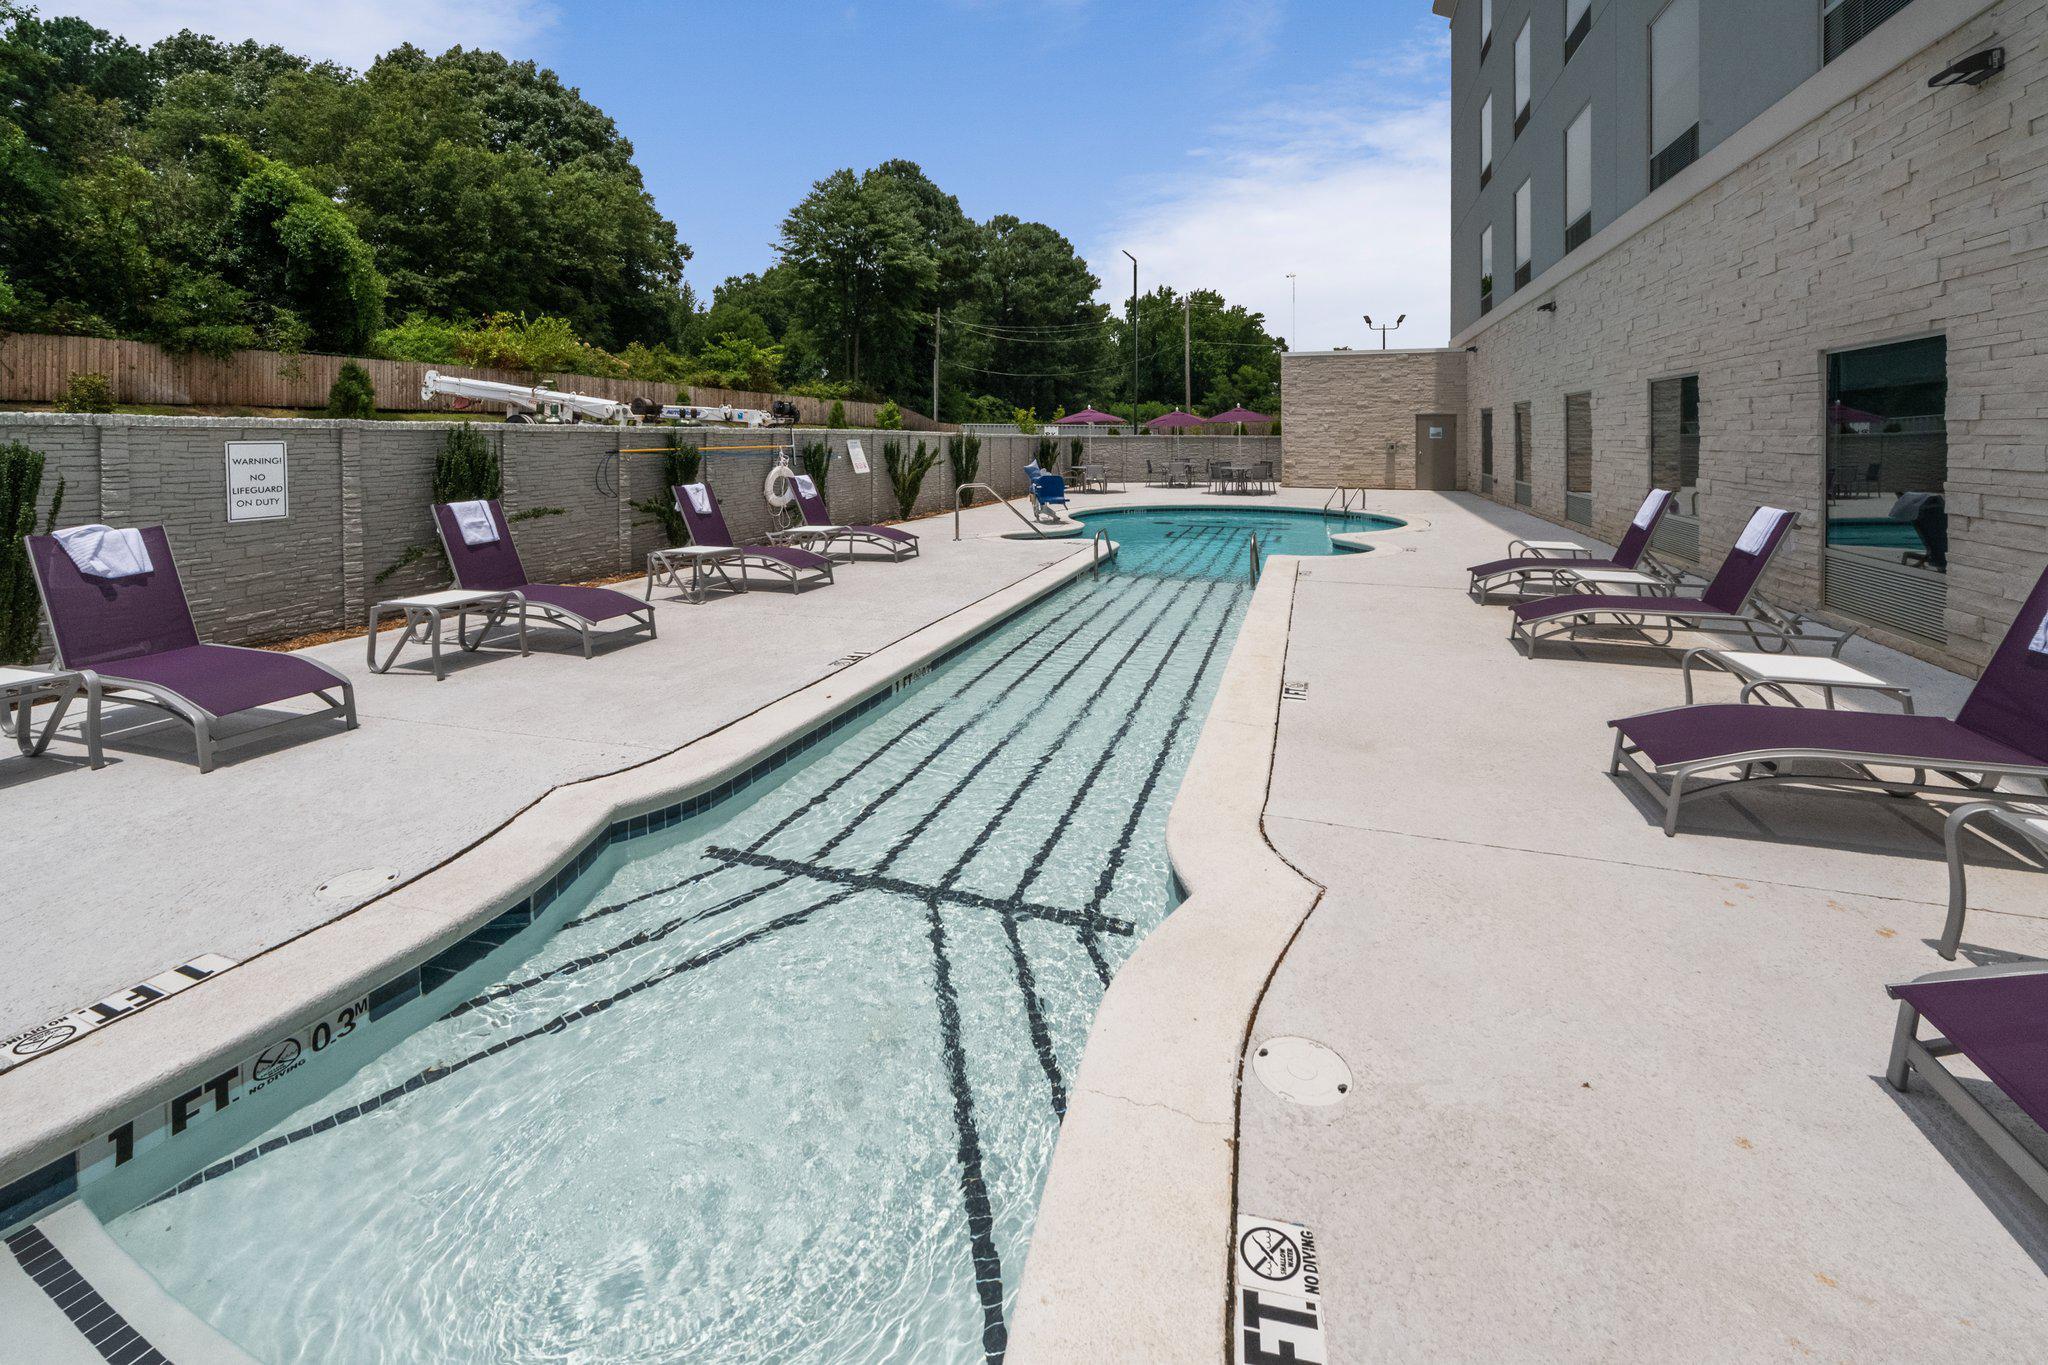 Holiday Inn Express & Suites Memphis Arpt Elvis Presley Blvd, an IHG Hotel